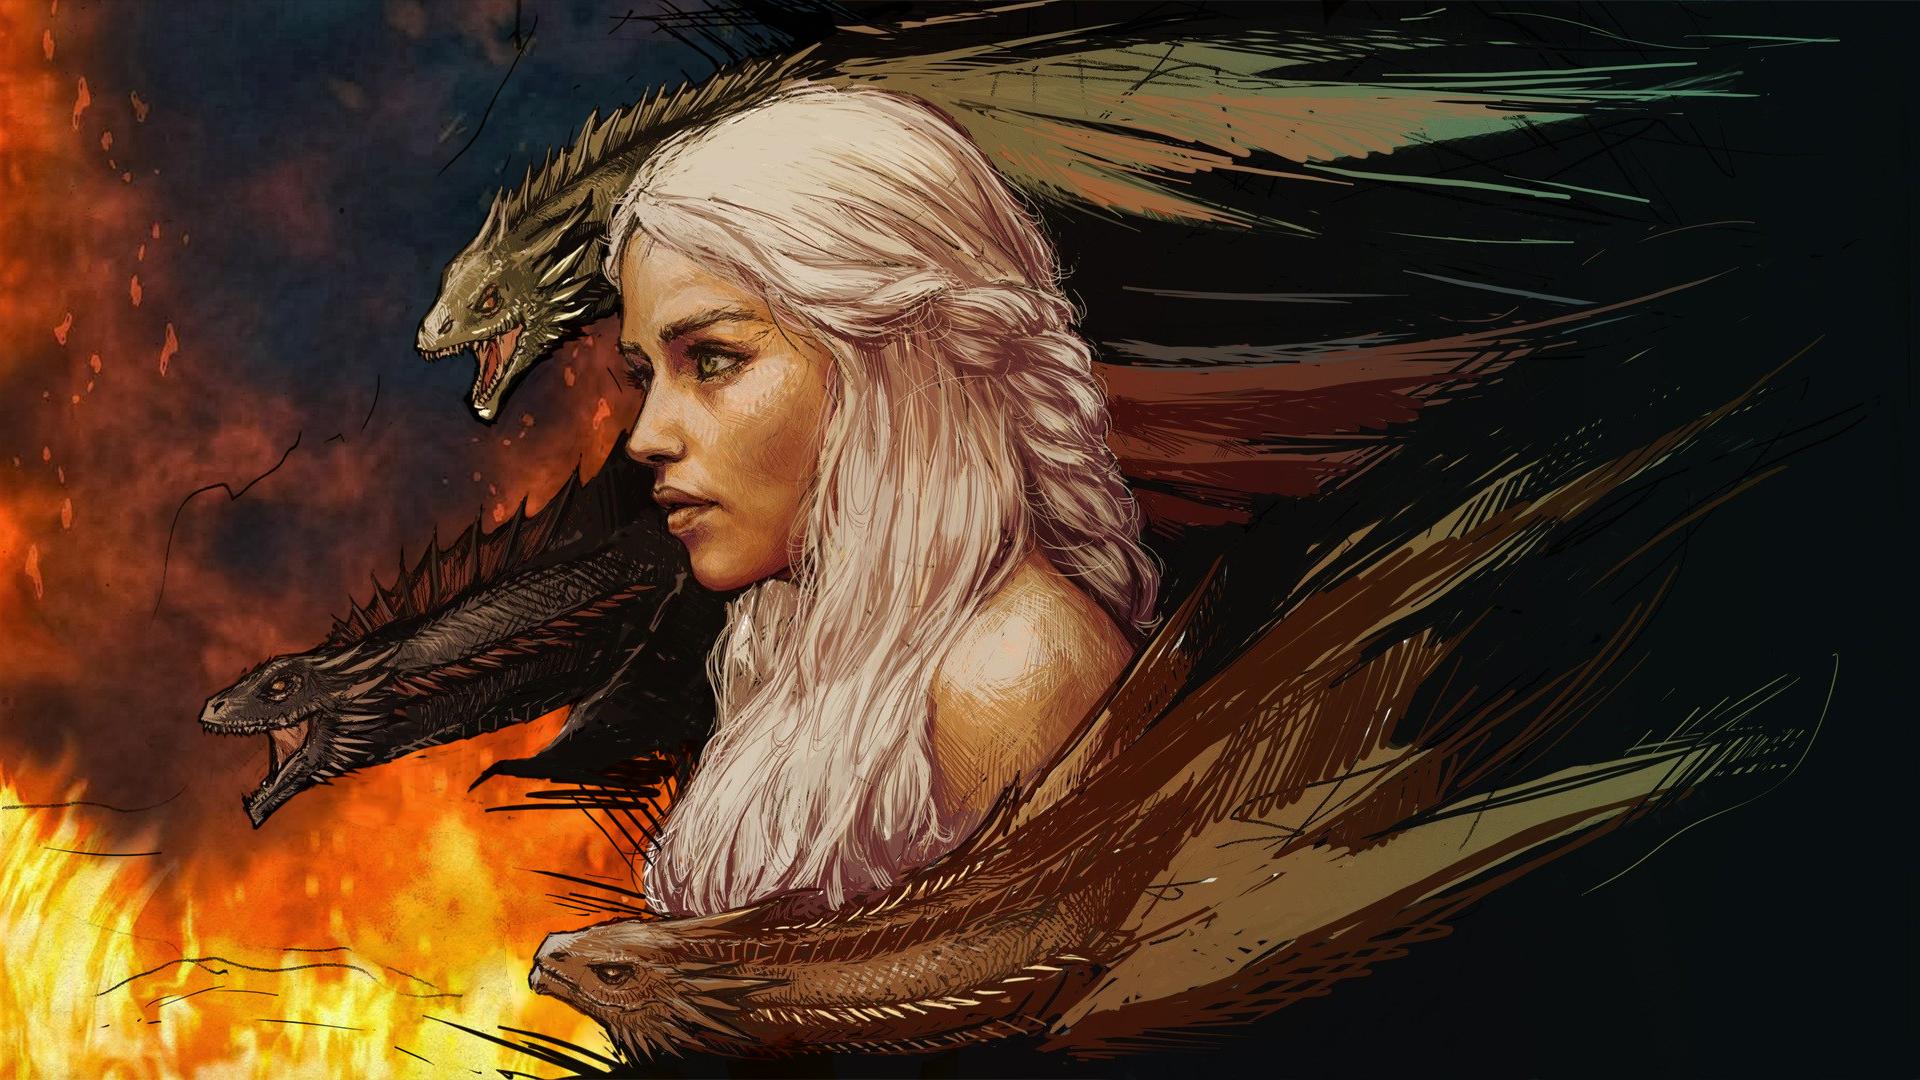 #daenerys Targaryen, #dragon, #game Of Thrones, #fire - Daenerys Targaryen Animated , HD Wallpaper & Backgrounds